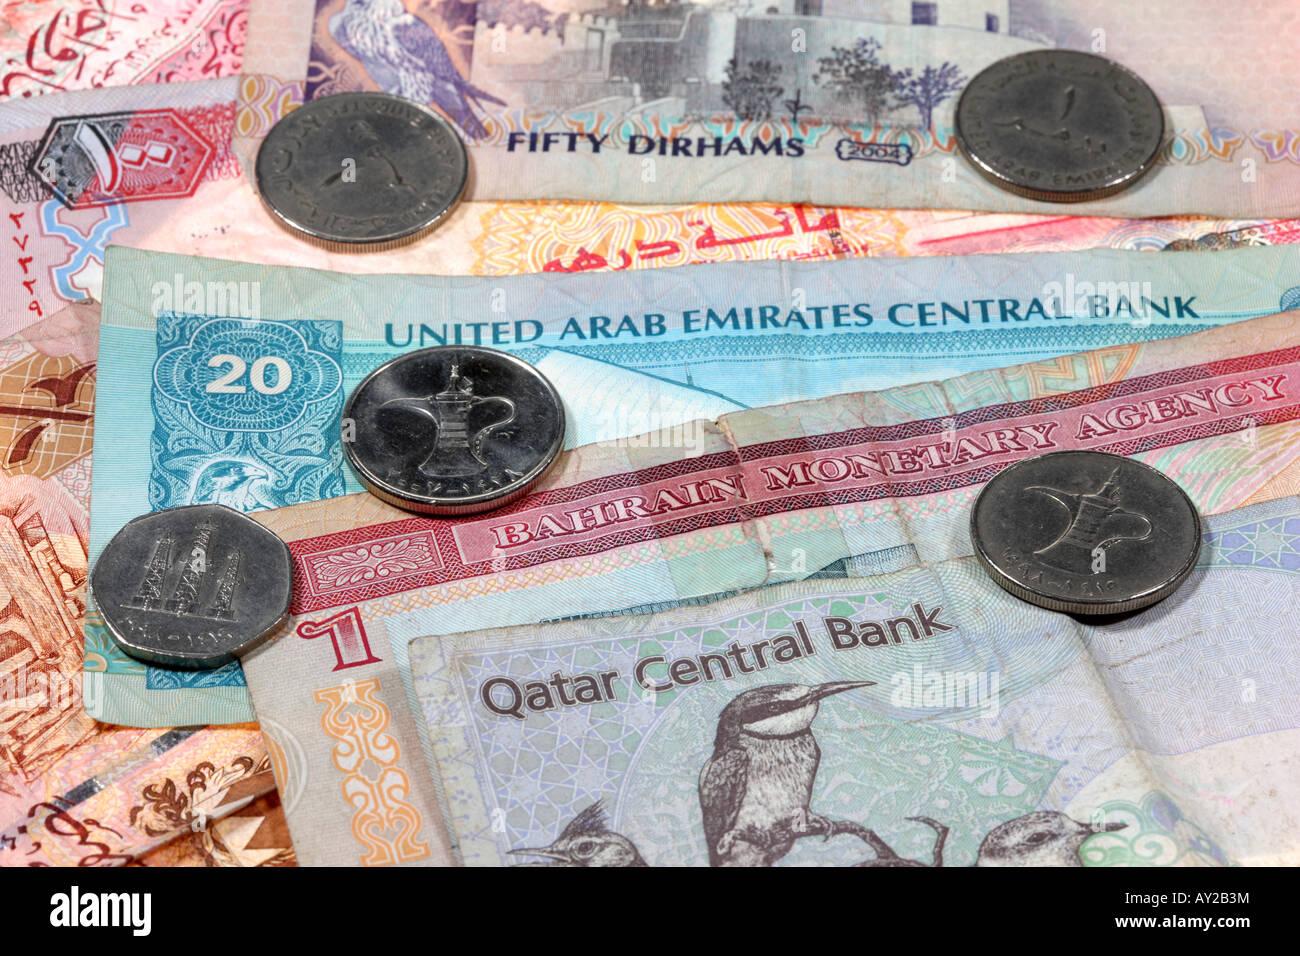 Dubai currency stock photos dubai currency stock images alamy money of qatar bahrain and the united arab emirates riyal dinar dirham stock biocorpaavc